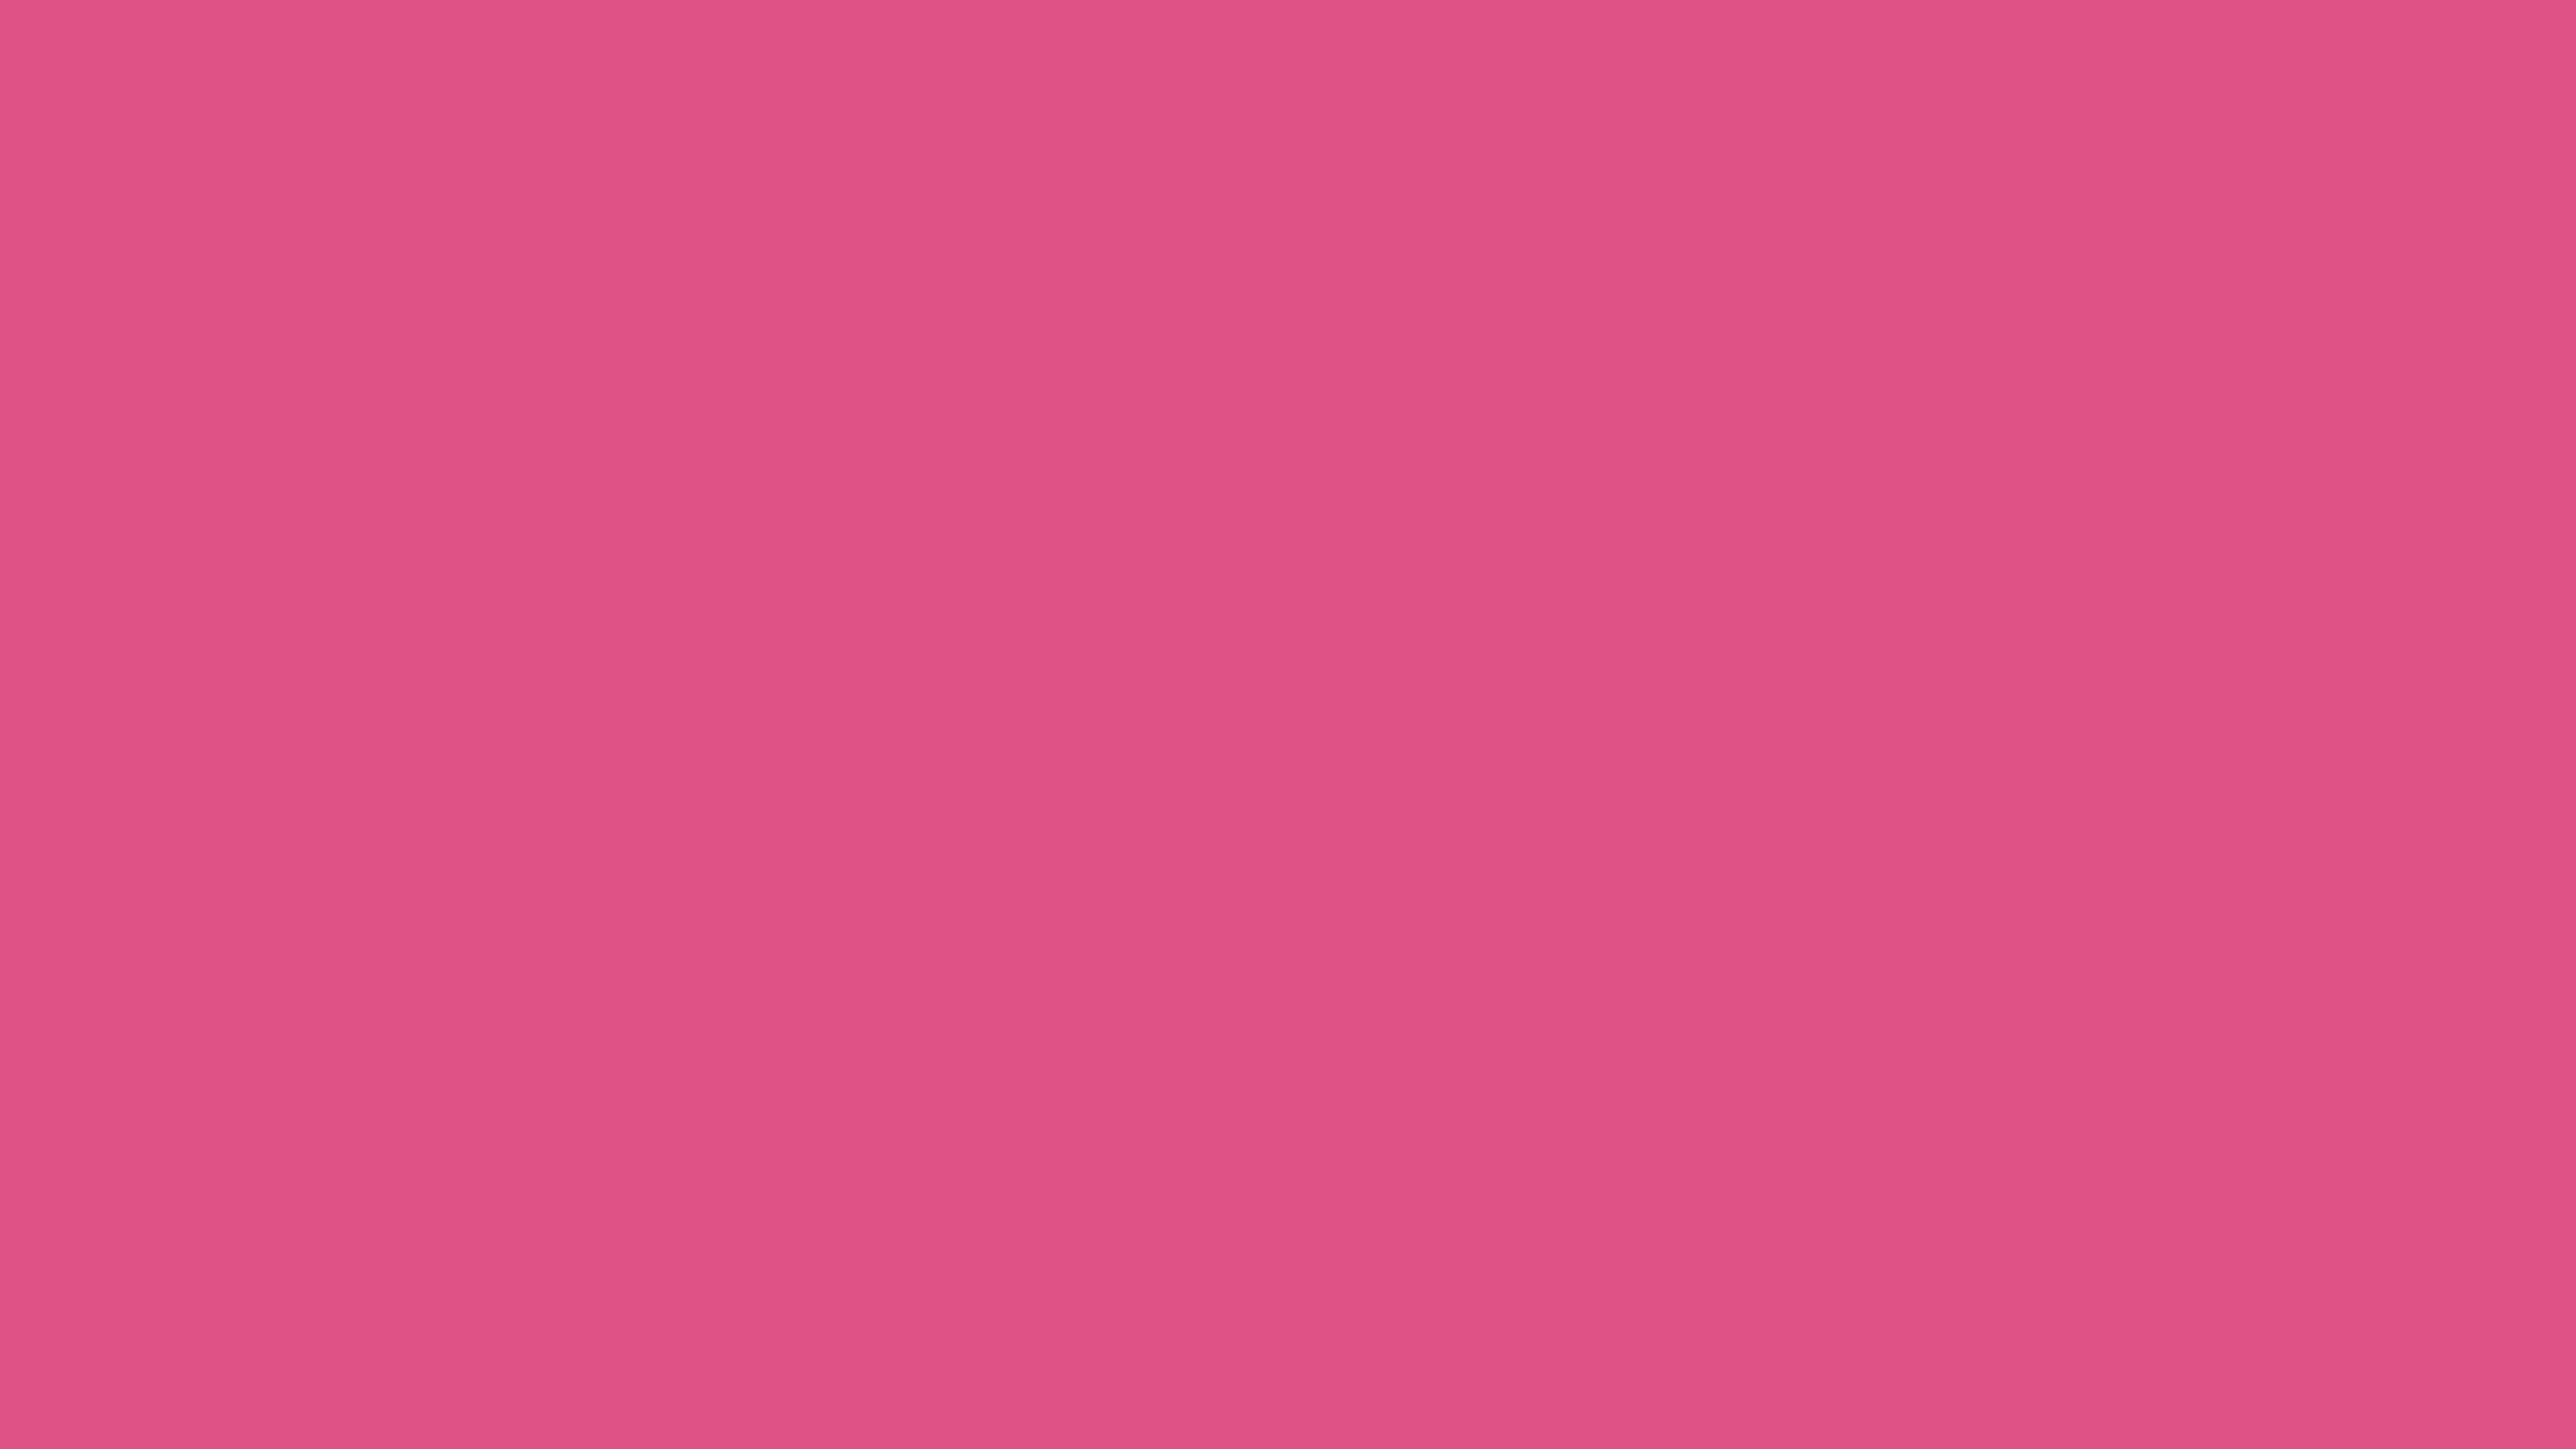 4096x2304 Fandango Pink Solid Color Background